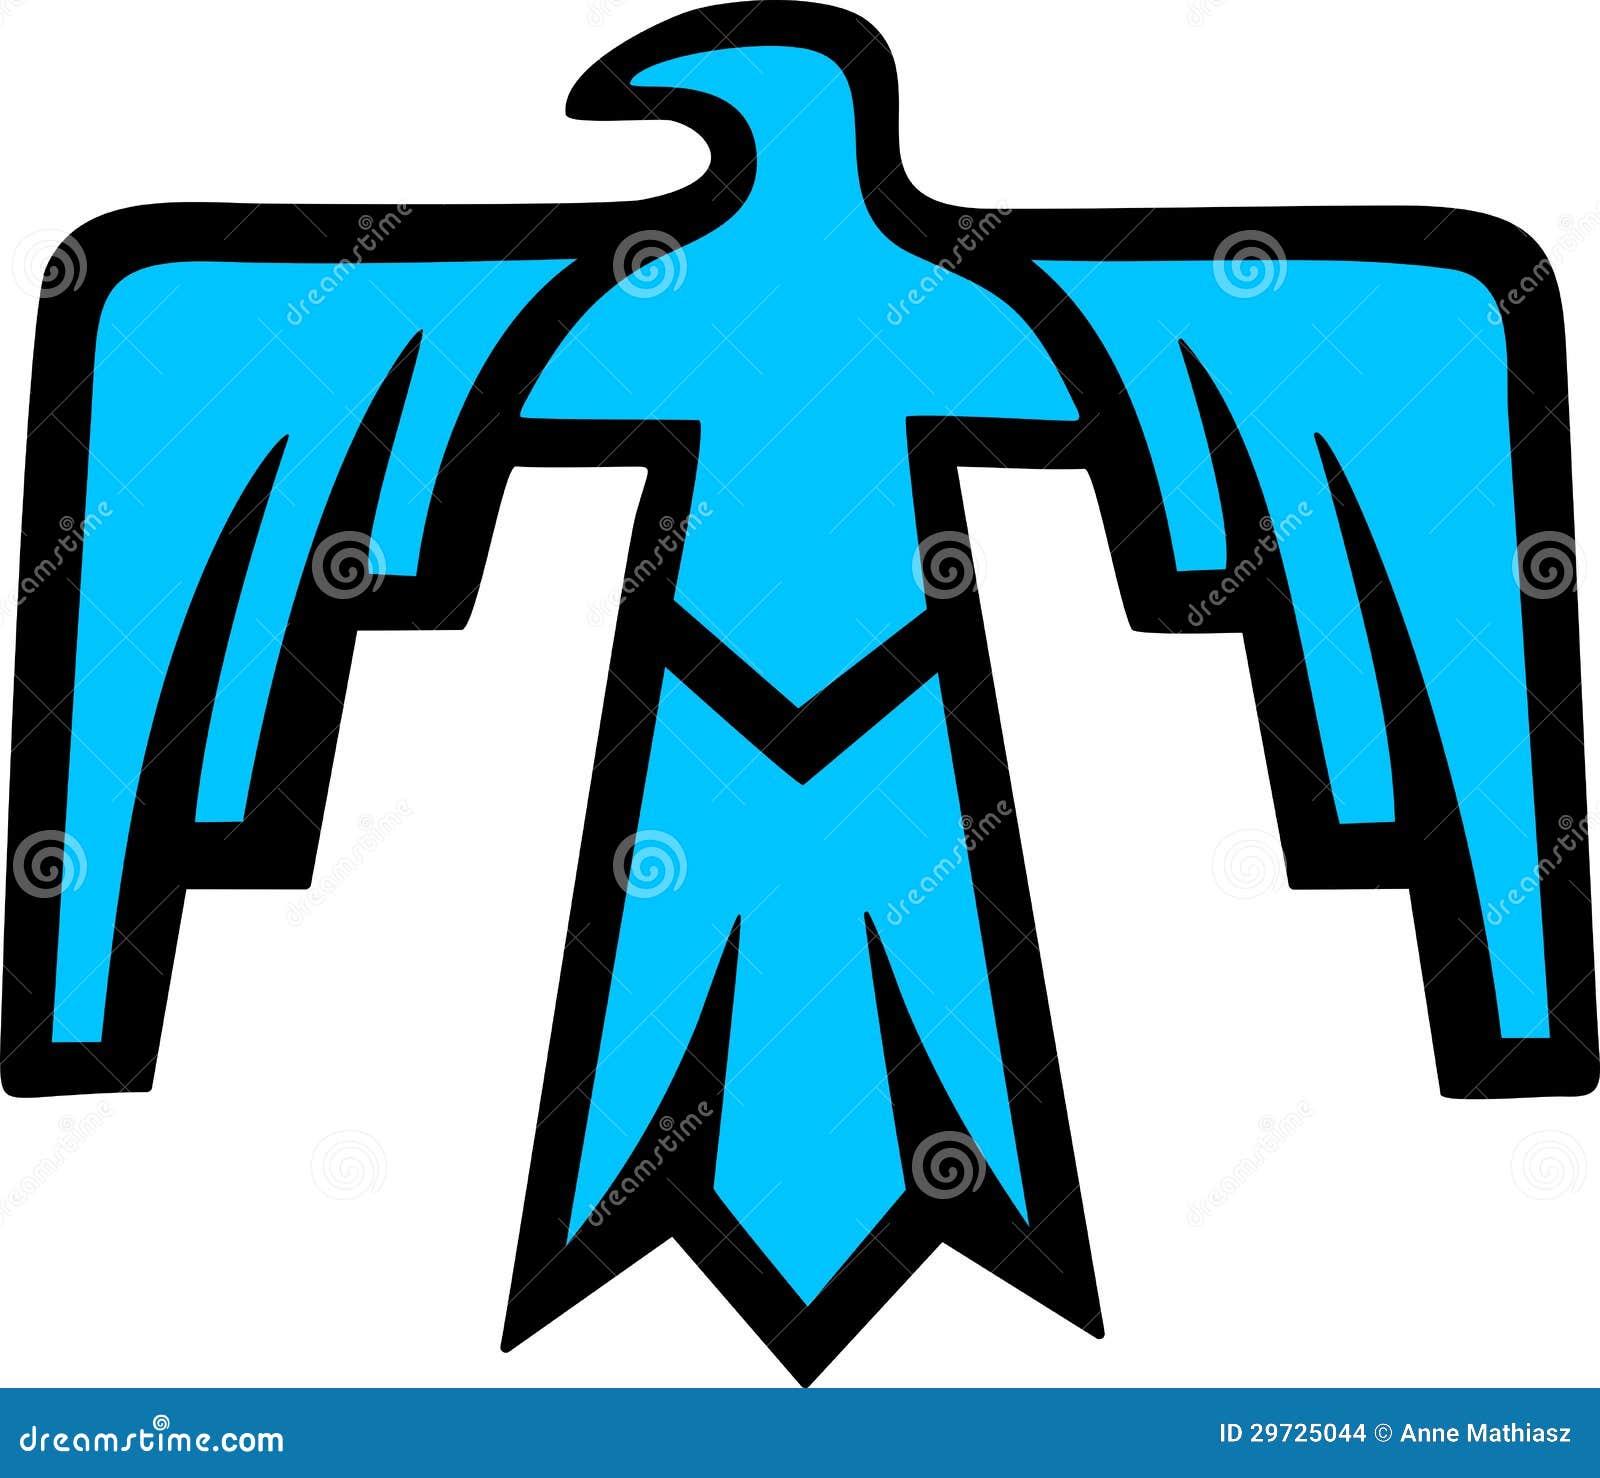 Thunderbird - native american Native American Thunderbird Designs